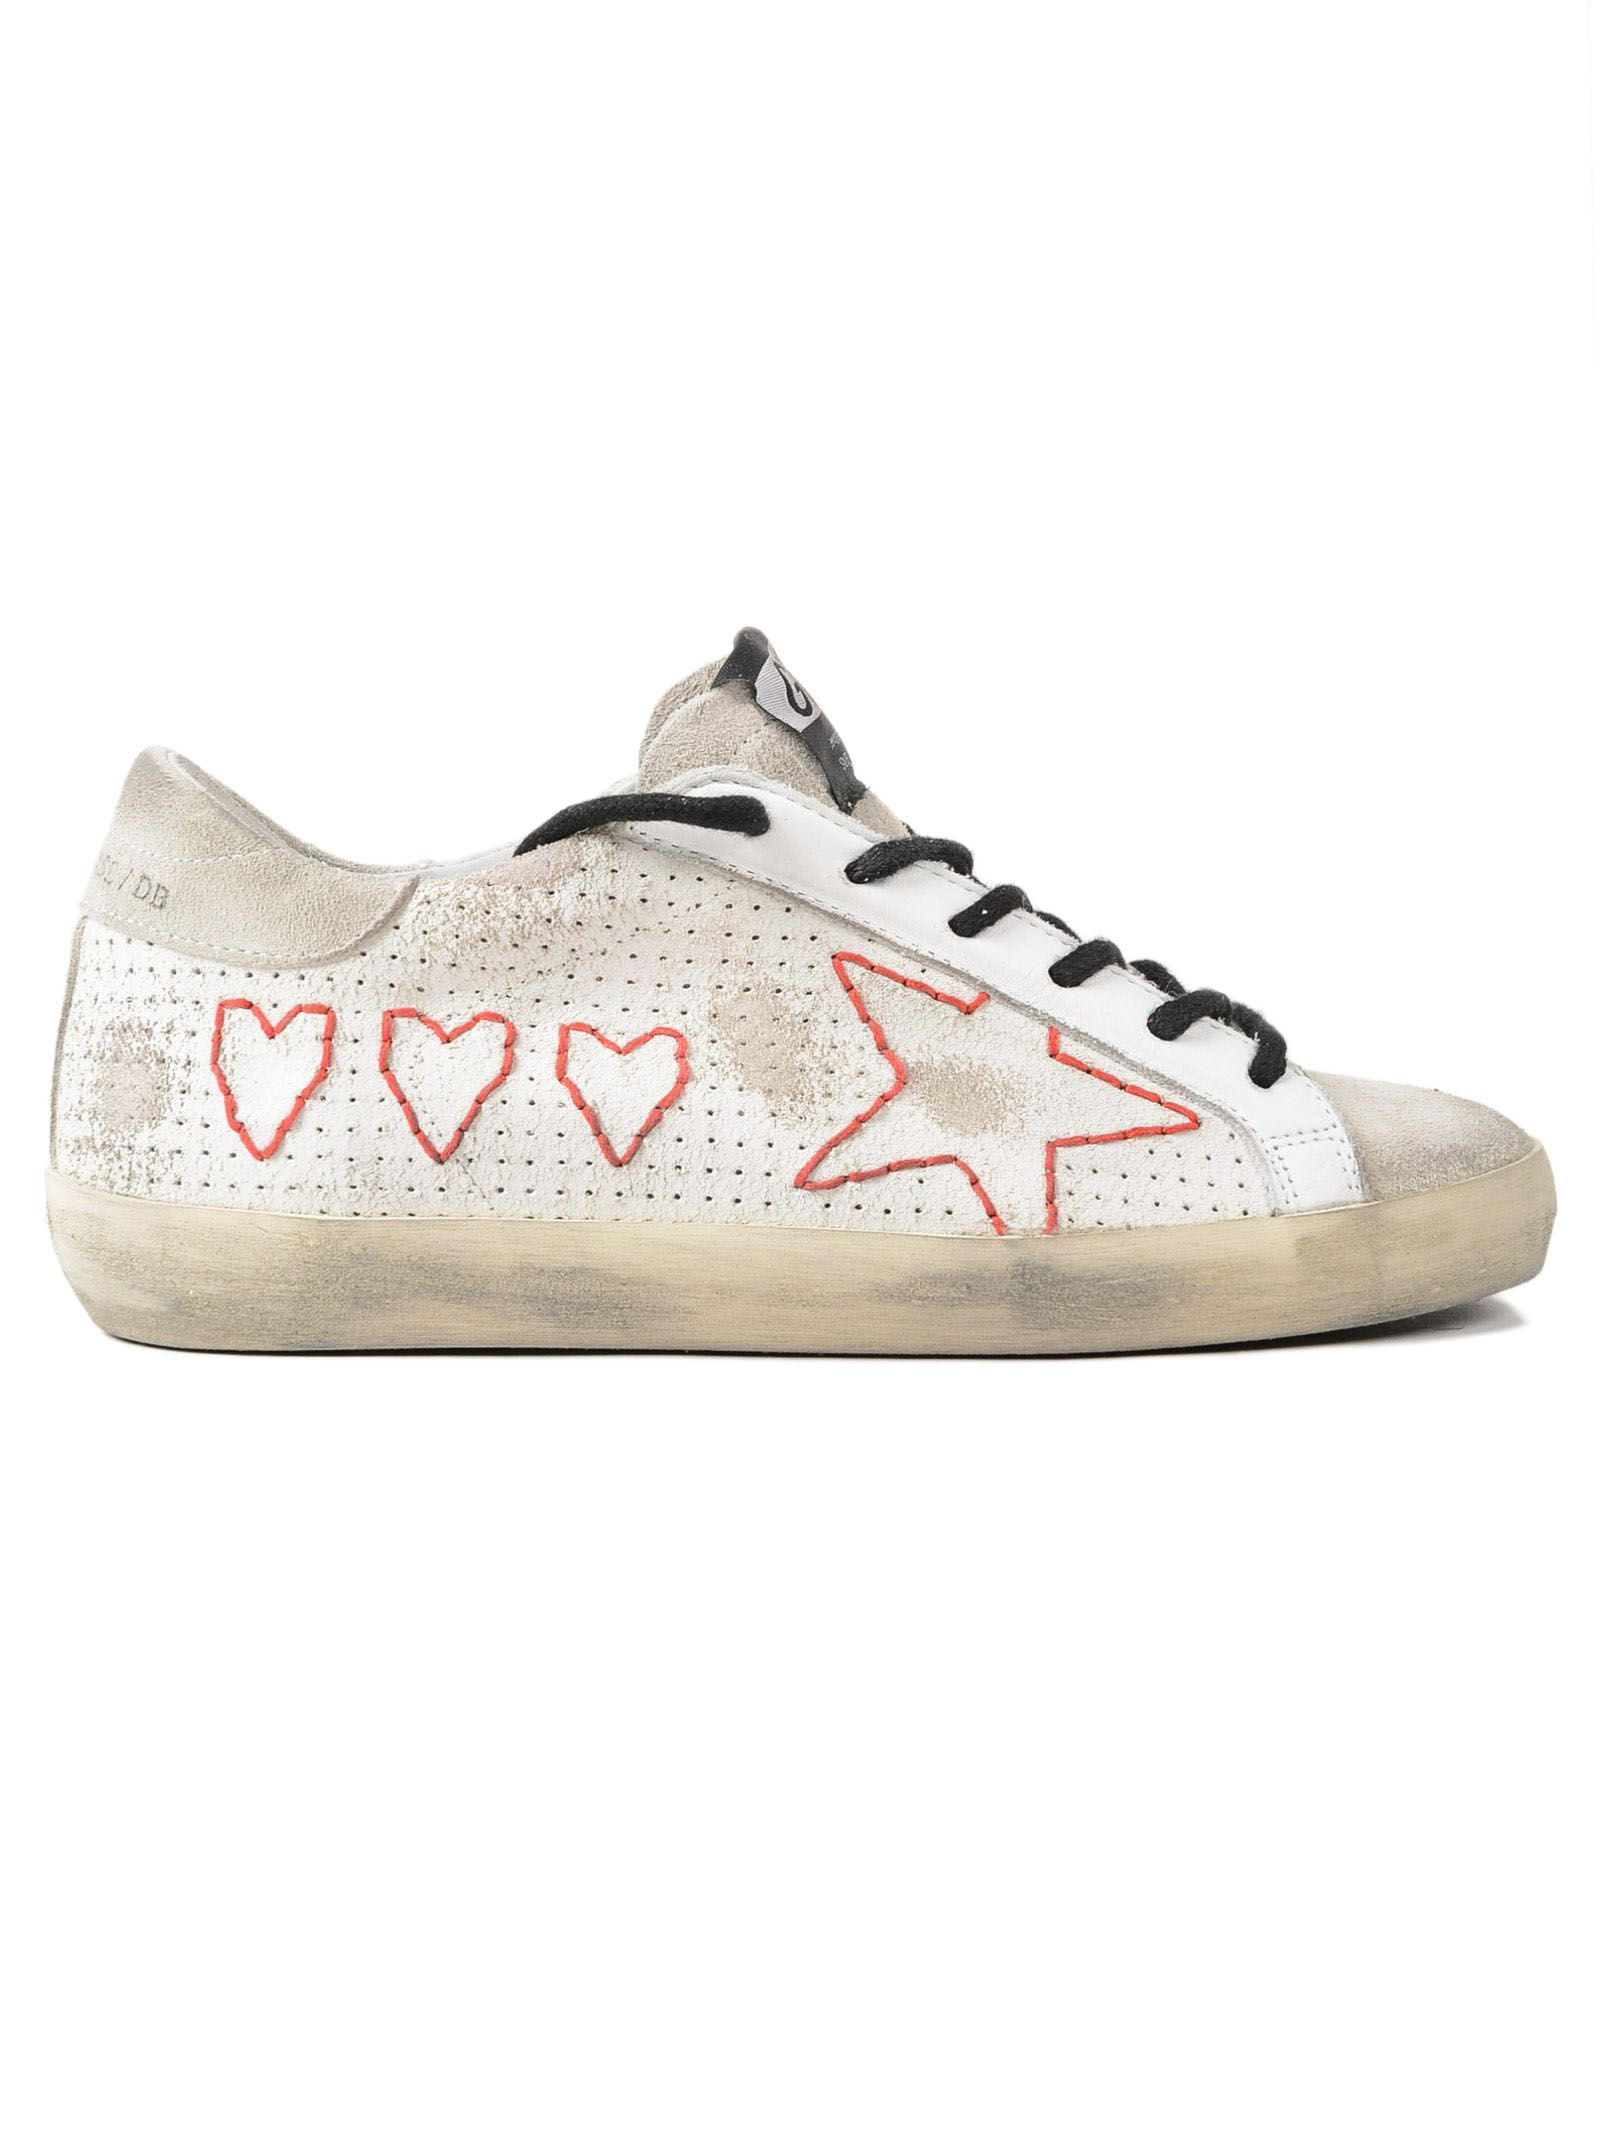 Sneakers Superstar Red Glitter Sand StarGolden Goose 24z9MKuw